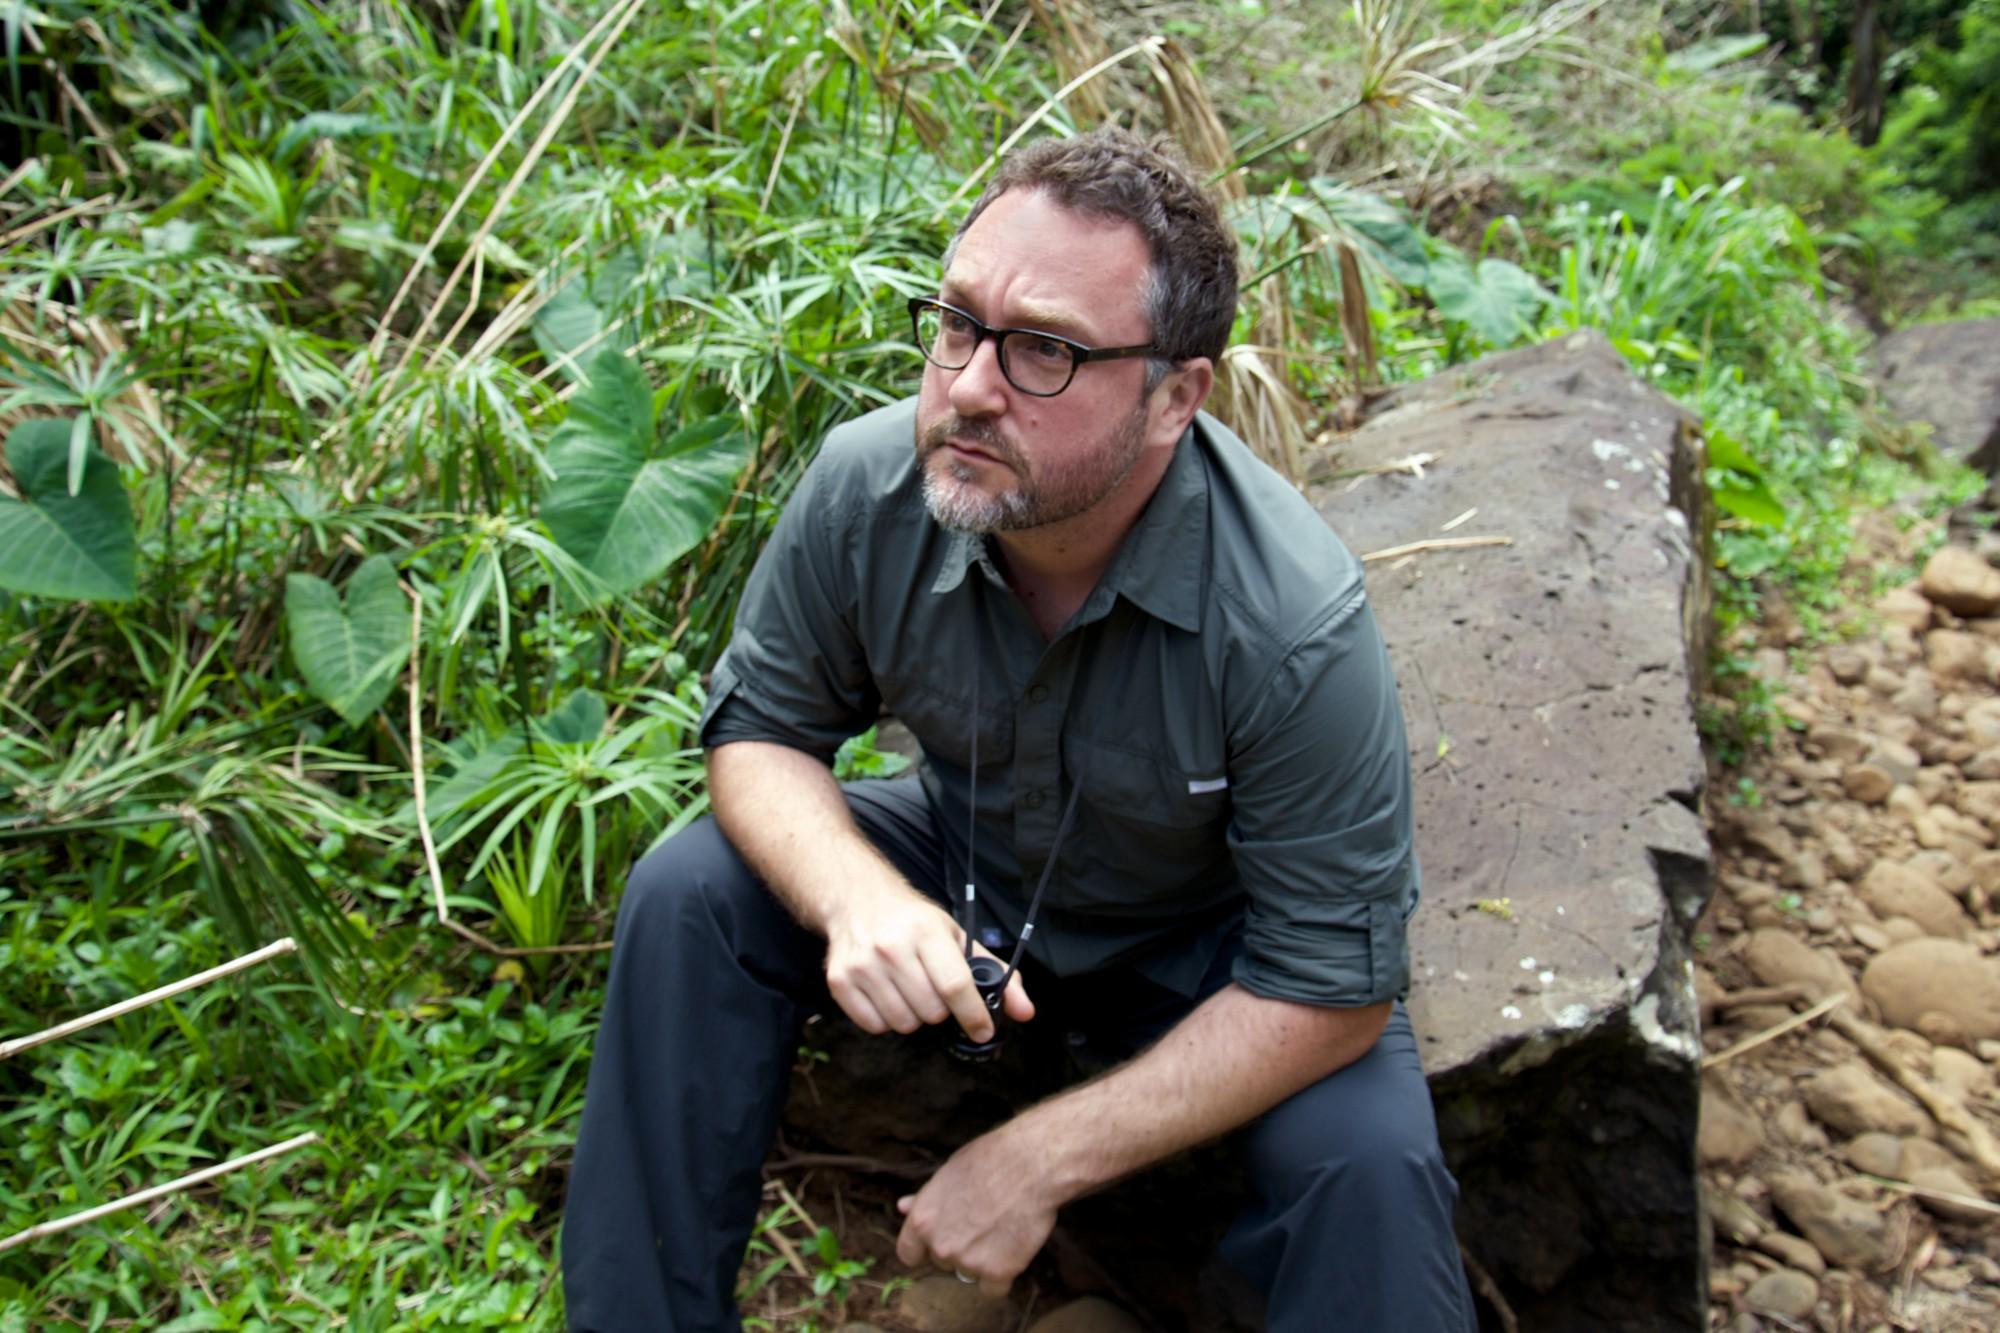 Director Colin Treverrow on the set of Jurassic World